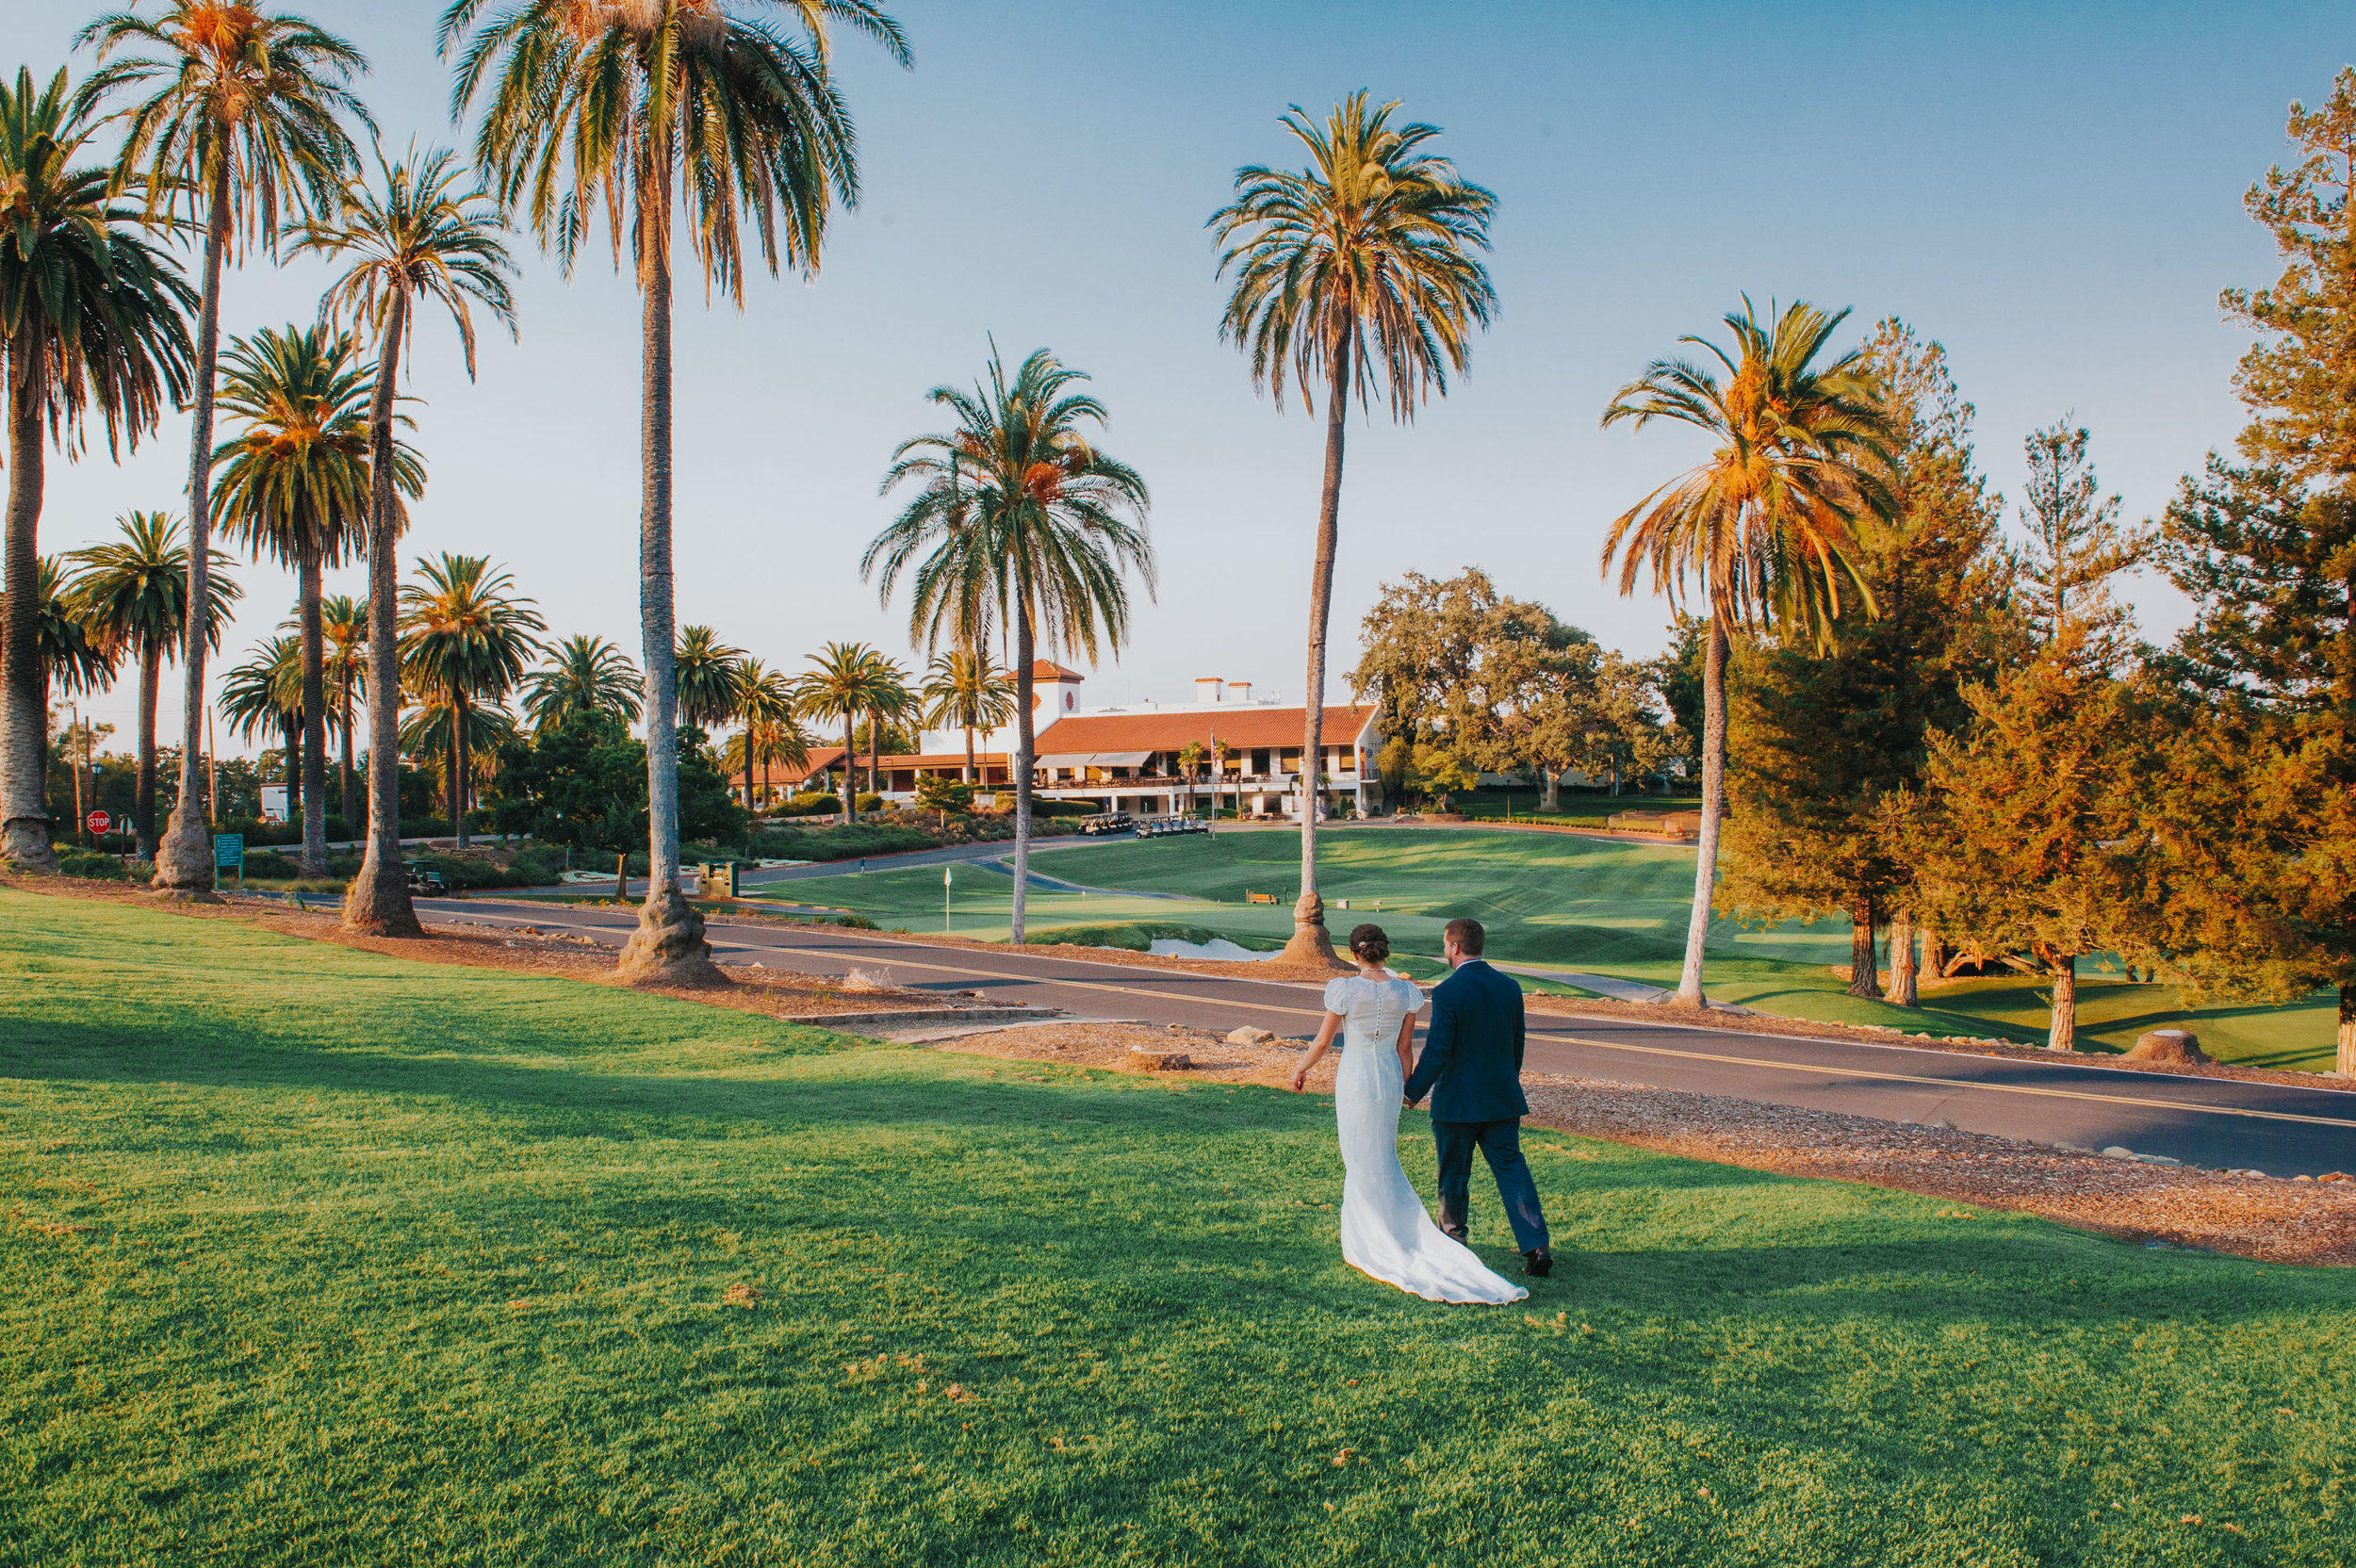 J-Hodges-Photography-Wedding-Photographer-Oak-Harbor (1 of 1).jpg